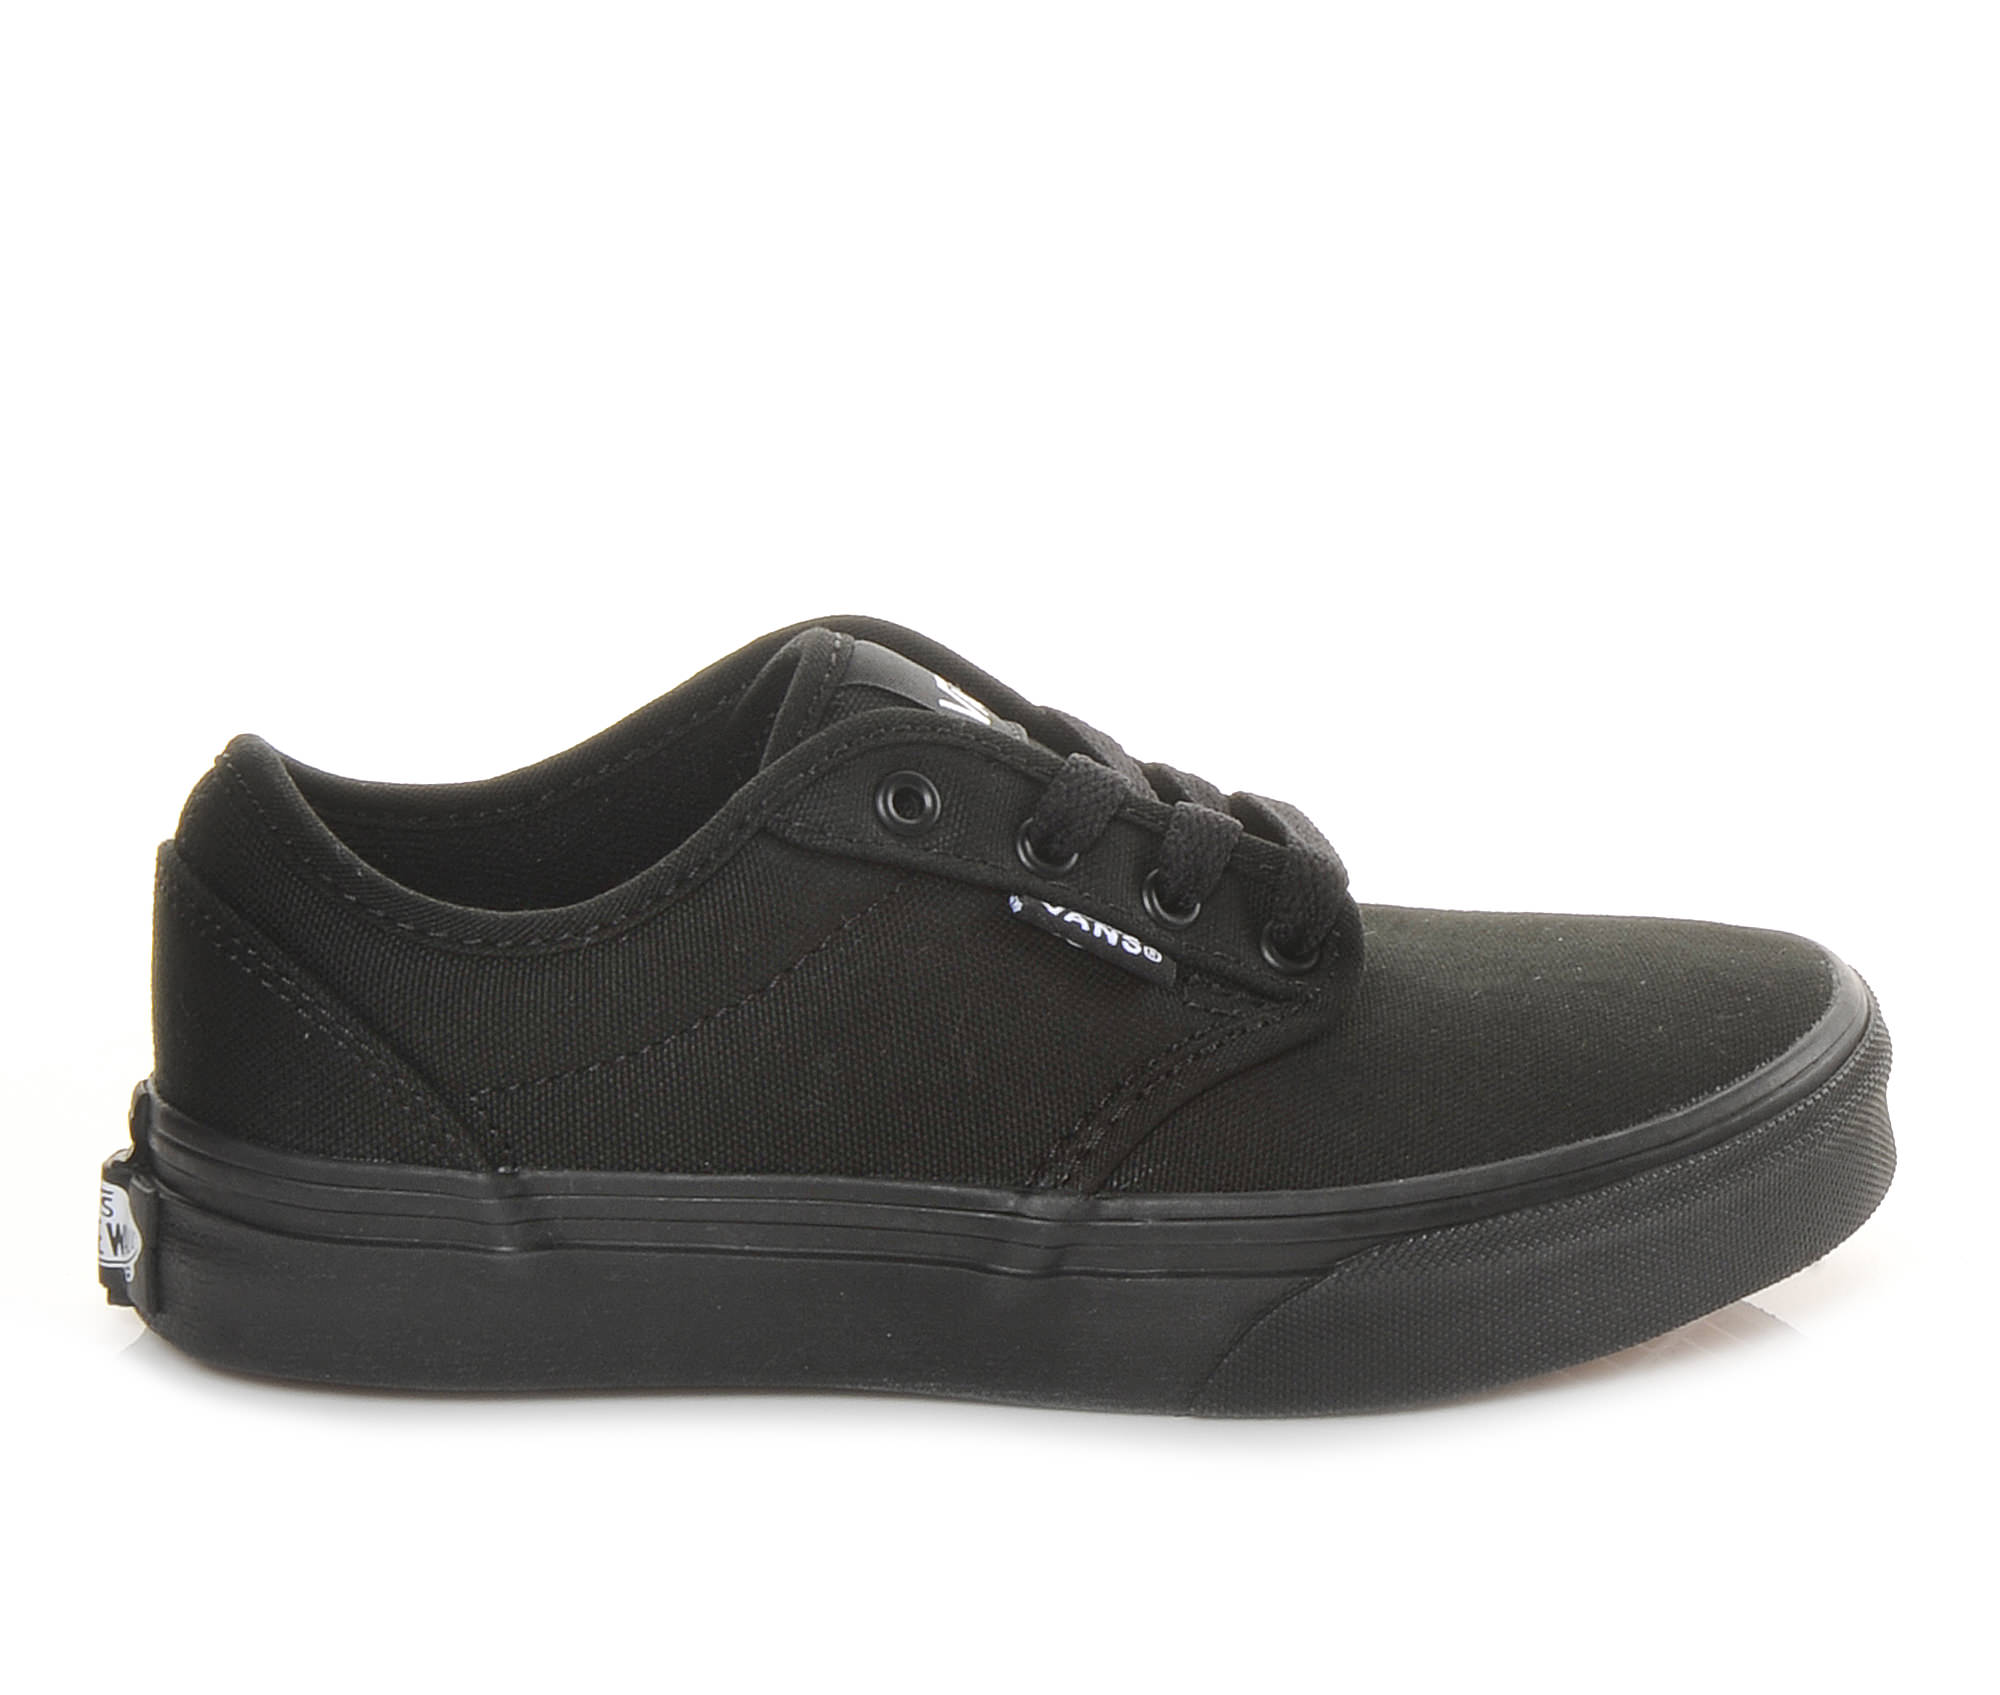 Boys' Vans Atwood Skate Shoes (Black)